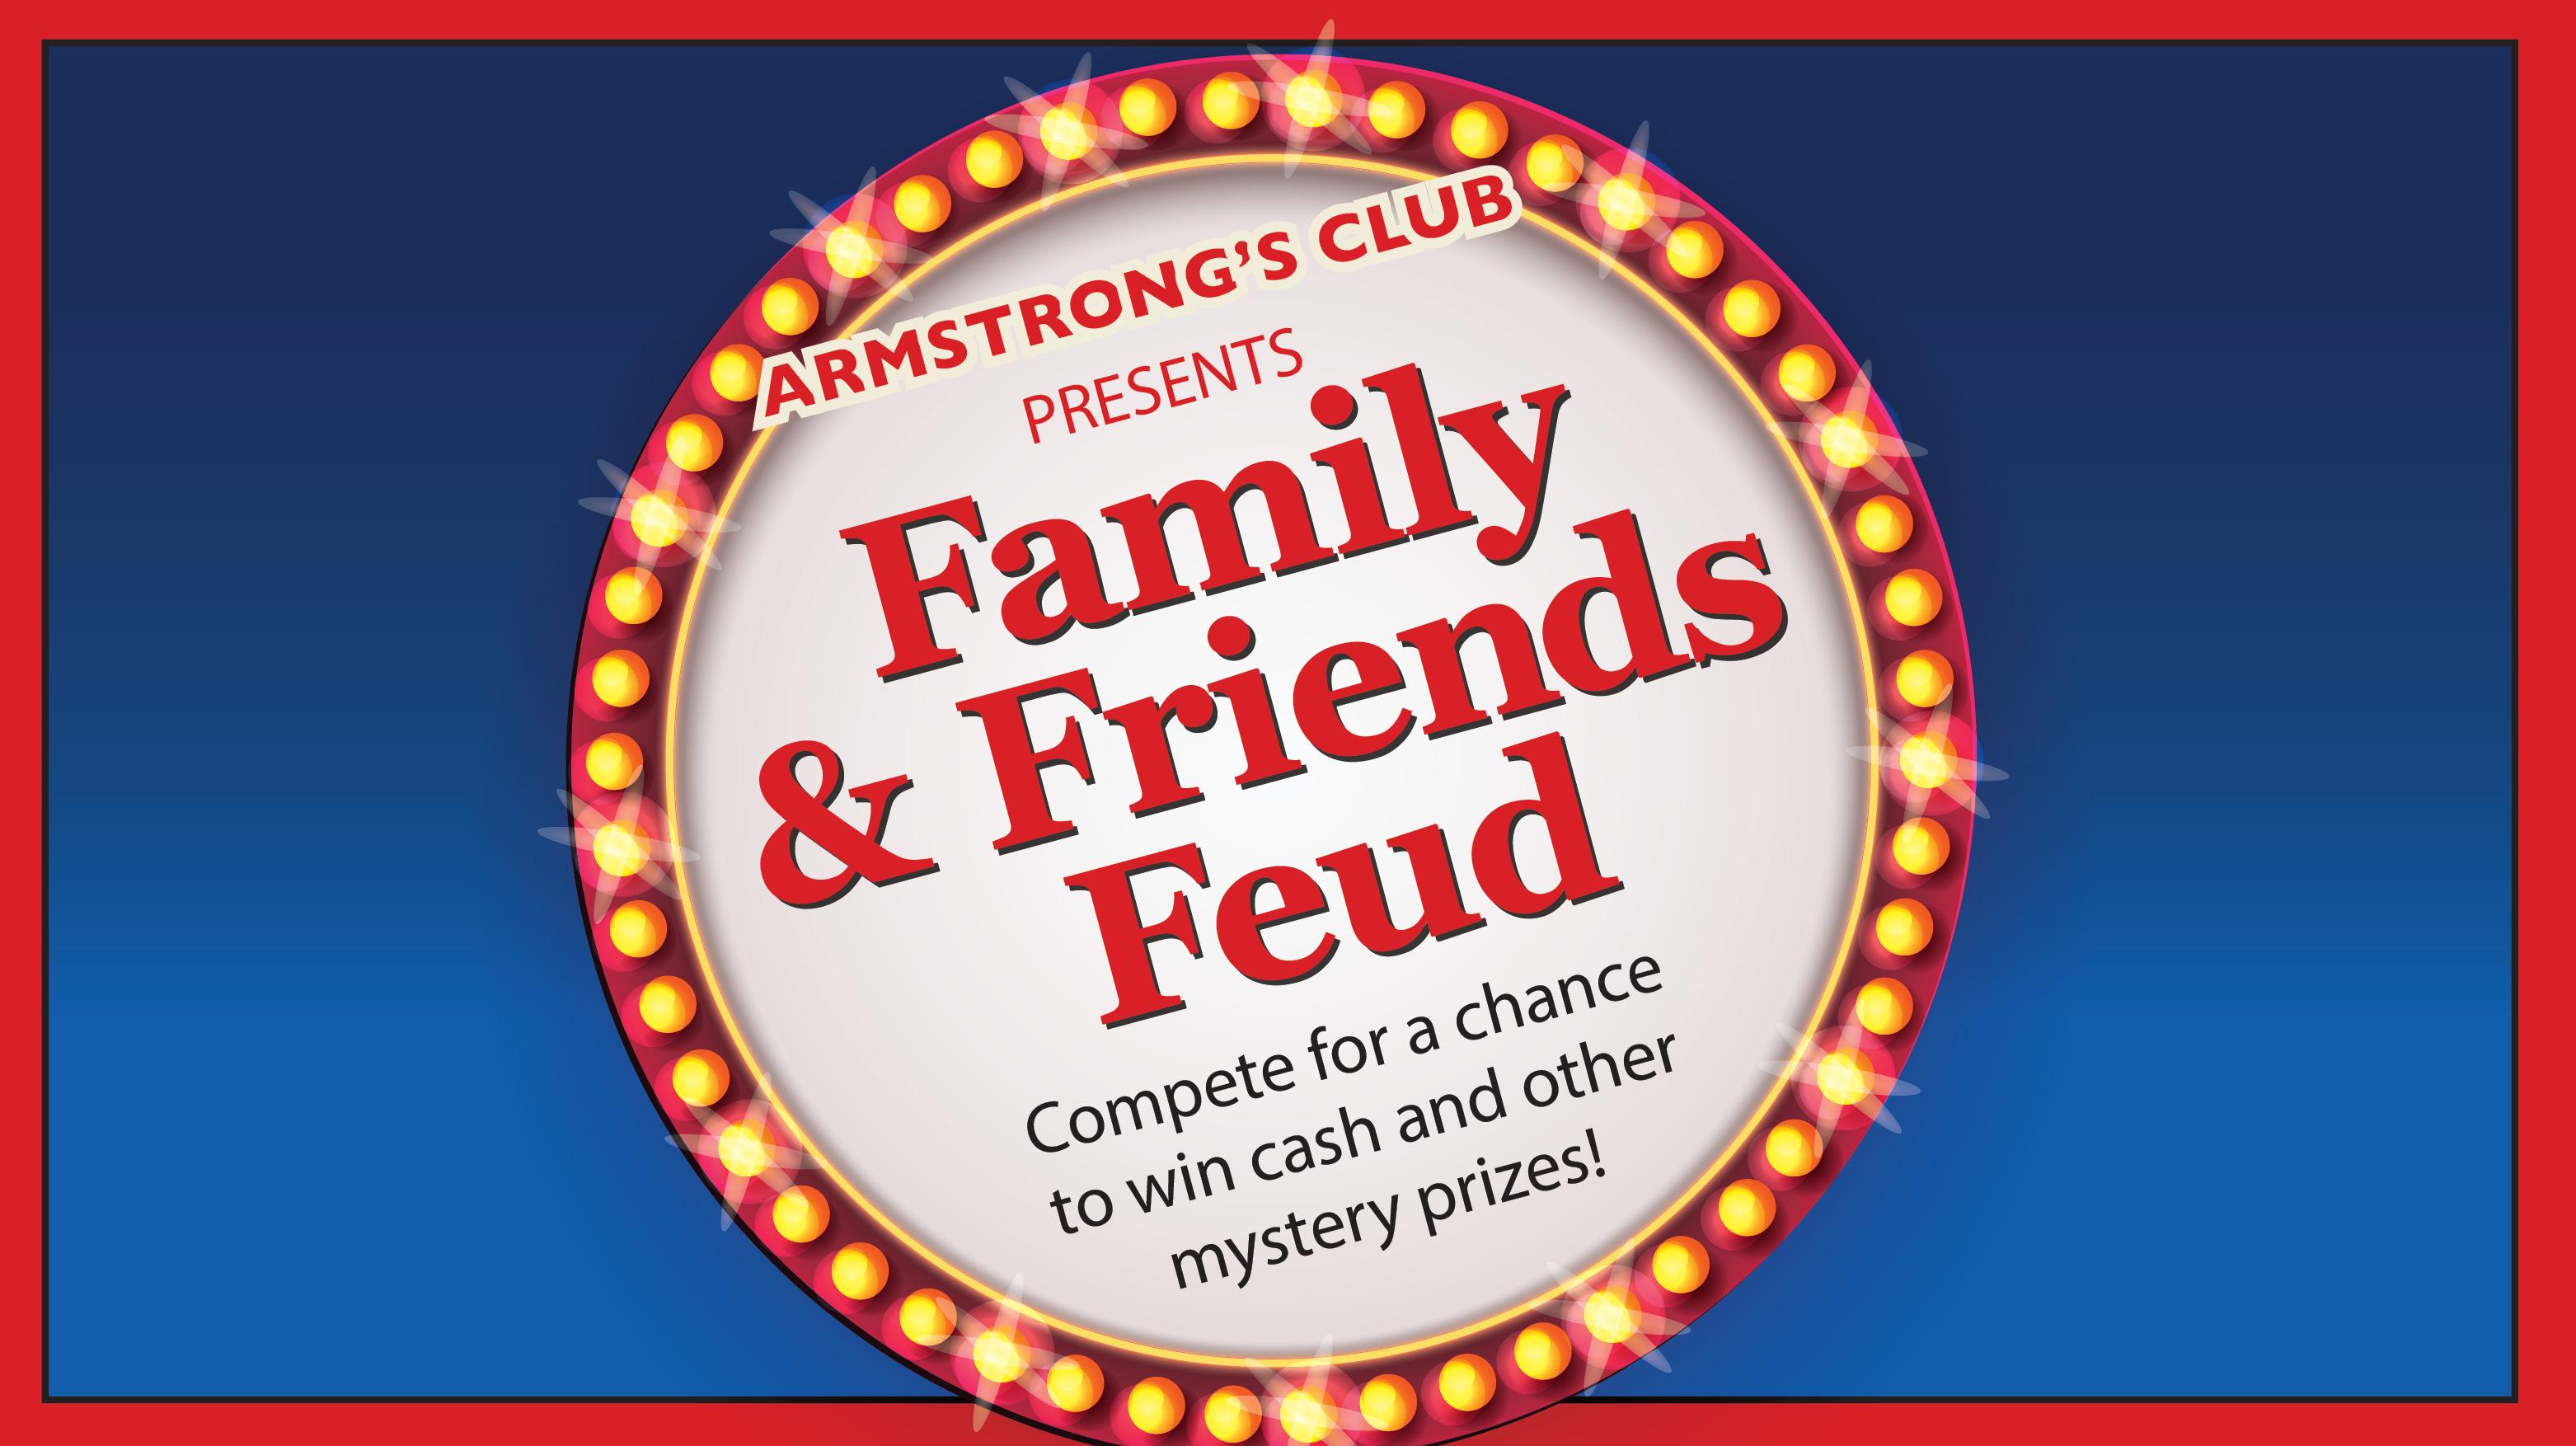 Family & Friends Feud